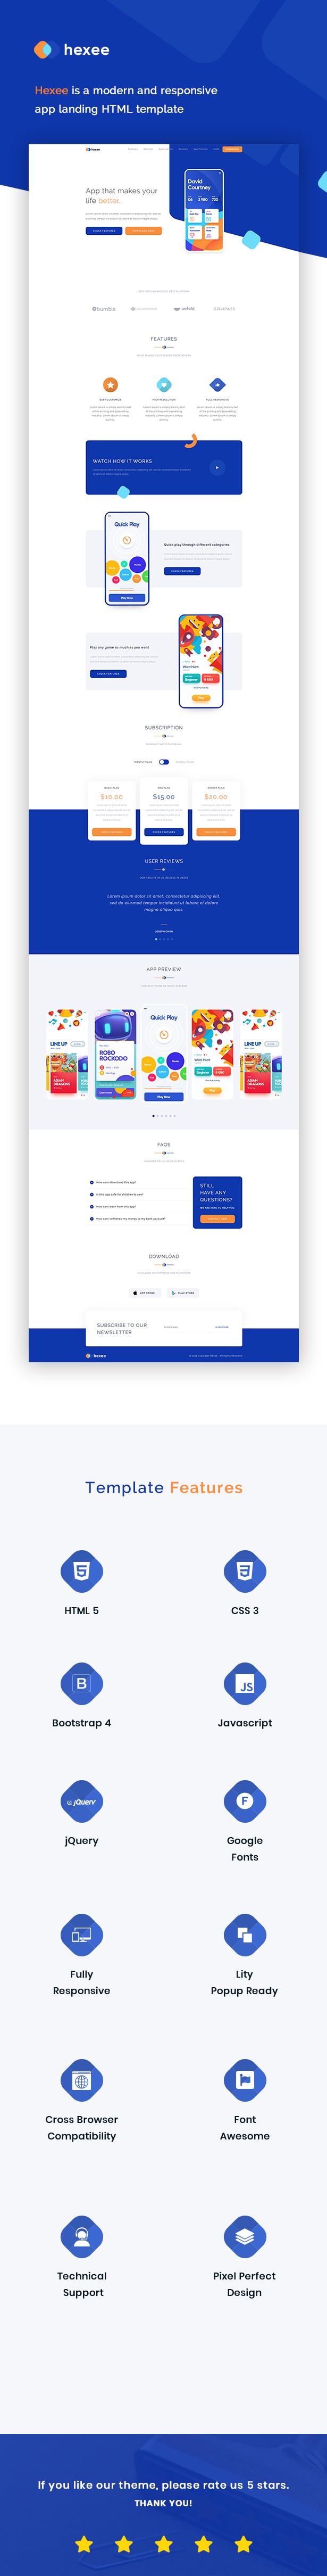 Hexee - Responsive Modern App Landing HTML Template - 1